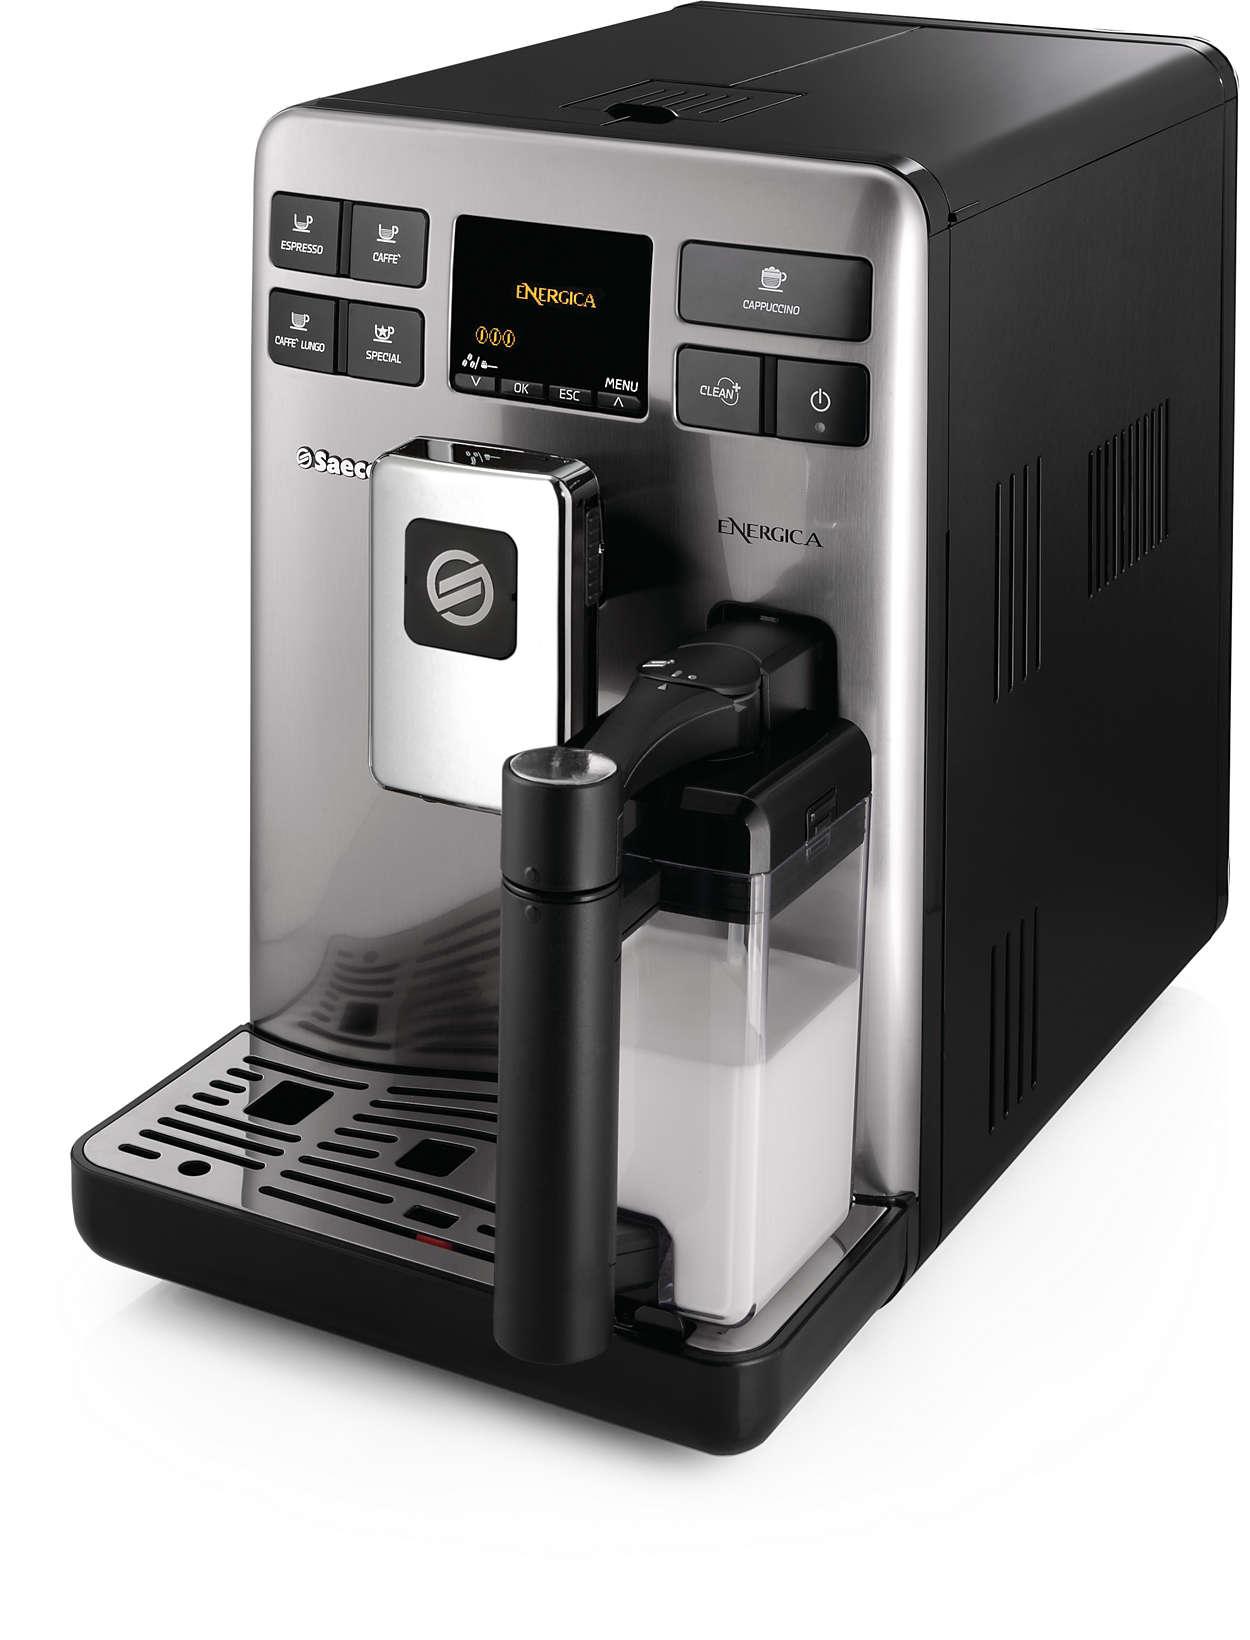 Des cafés et espressos parfaits